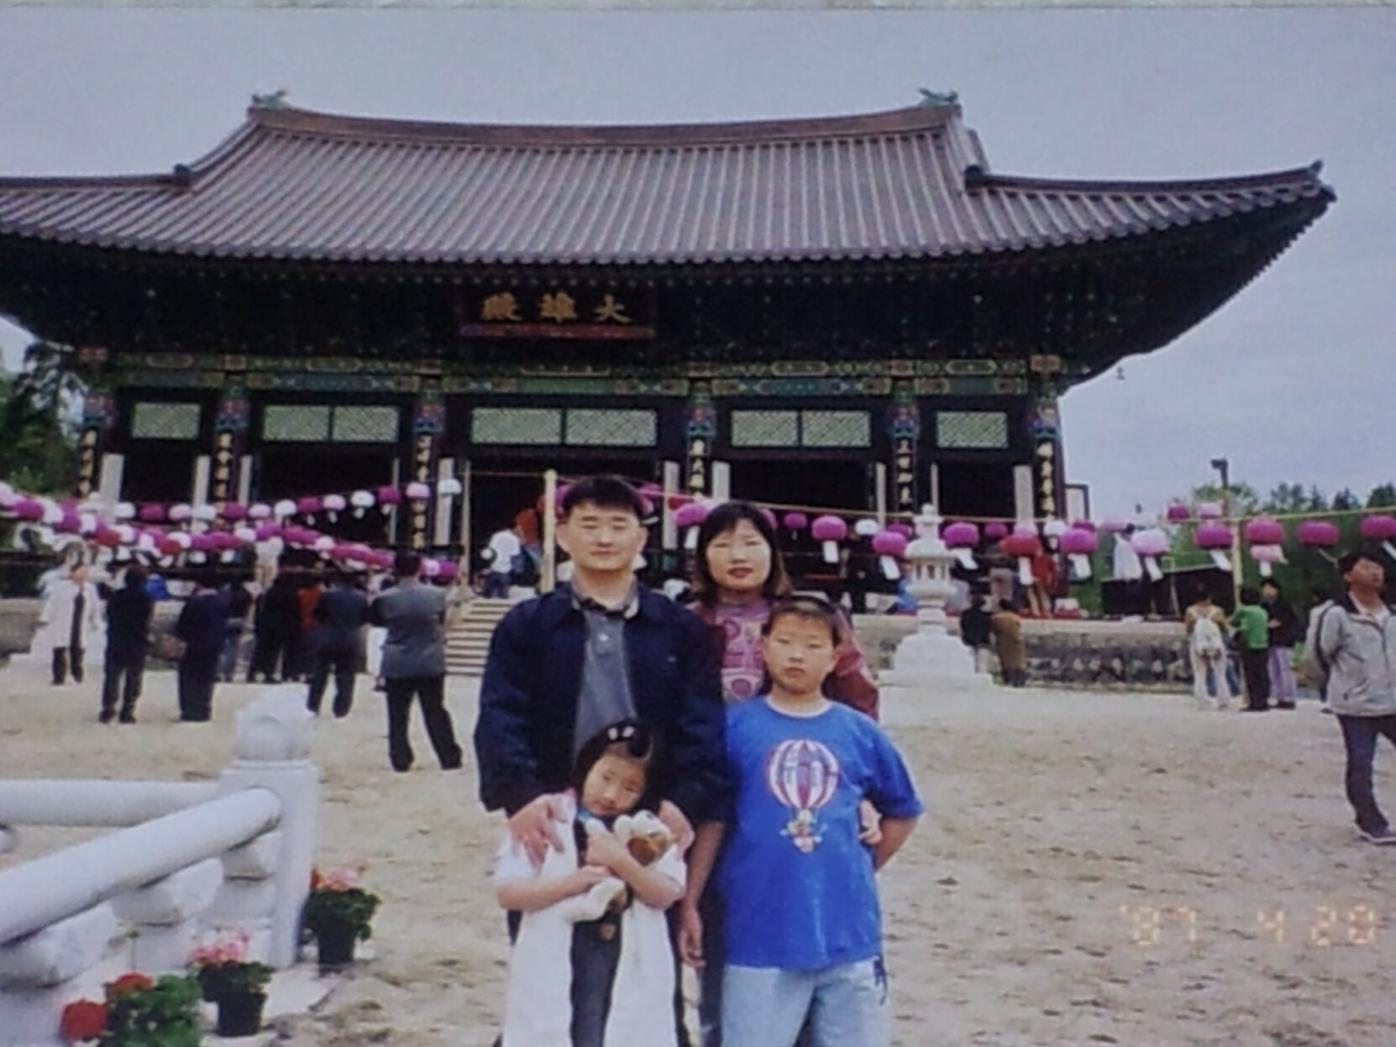 Kim Buddhist Temple